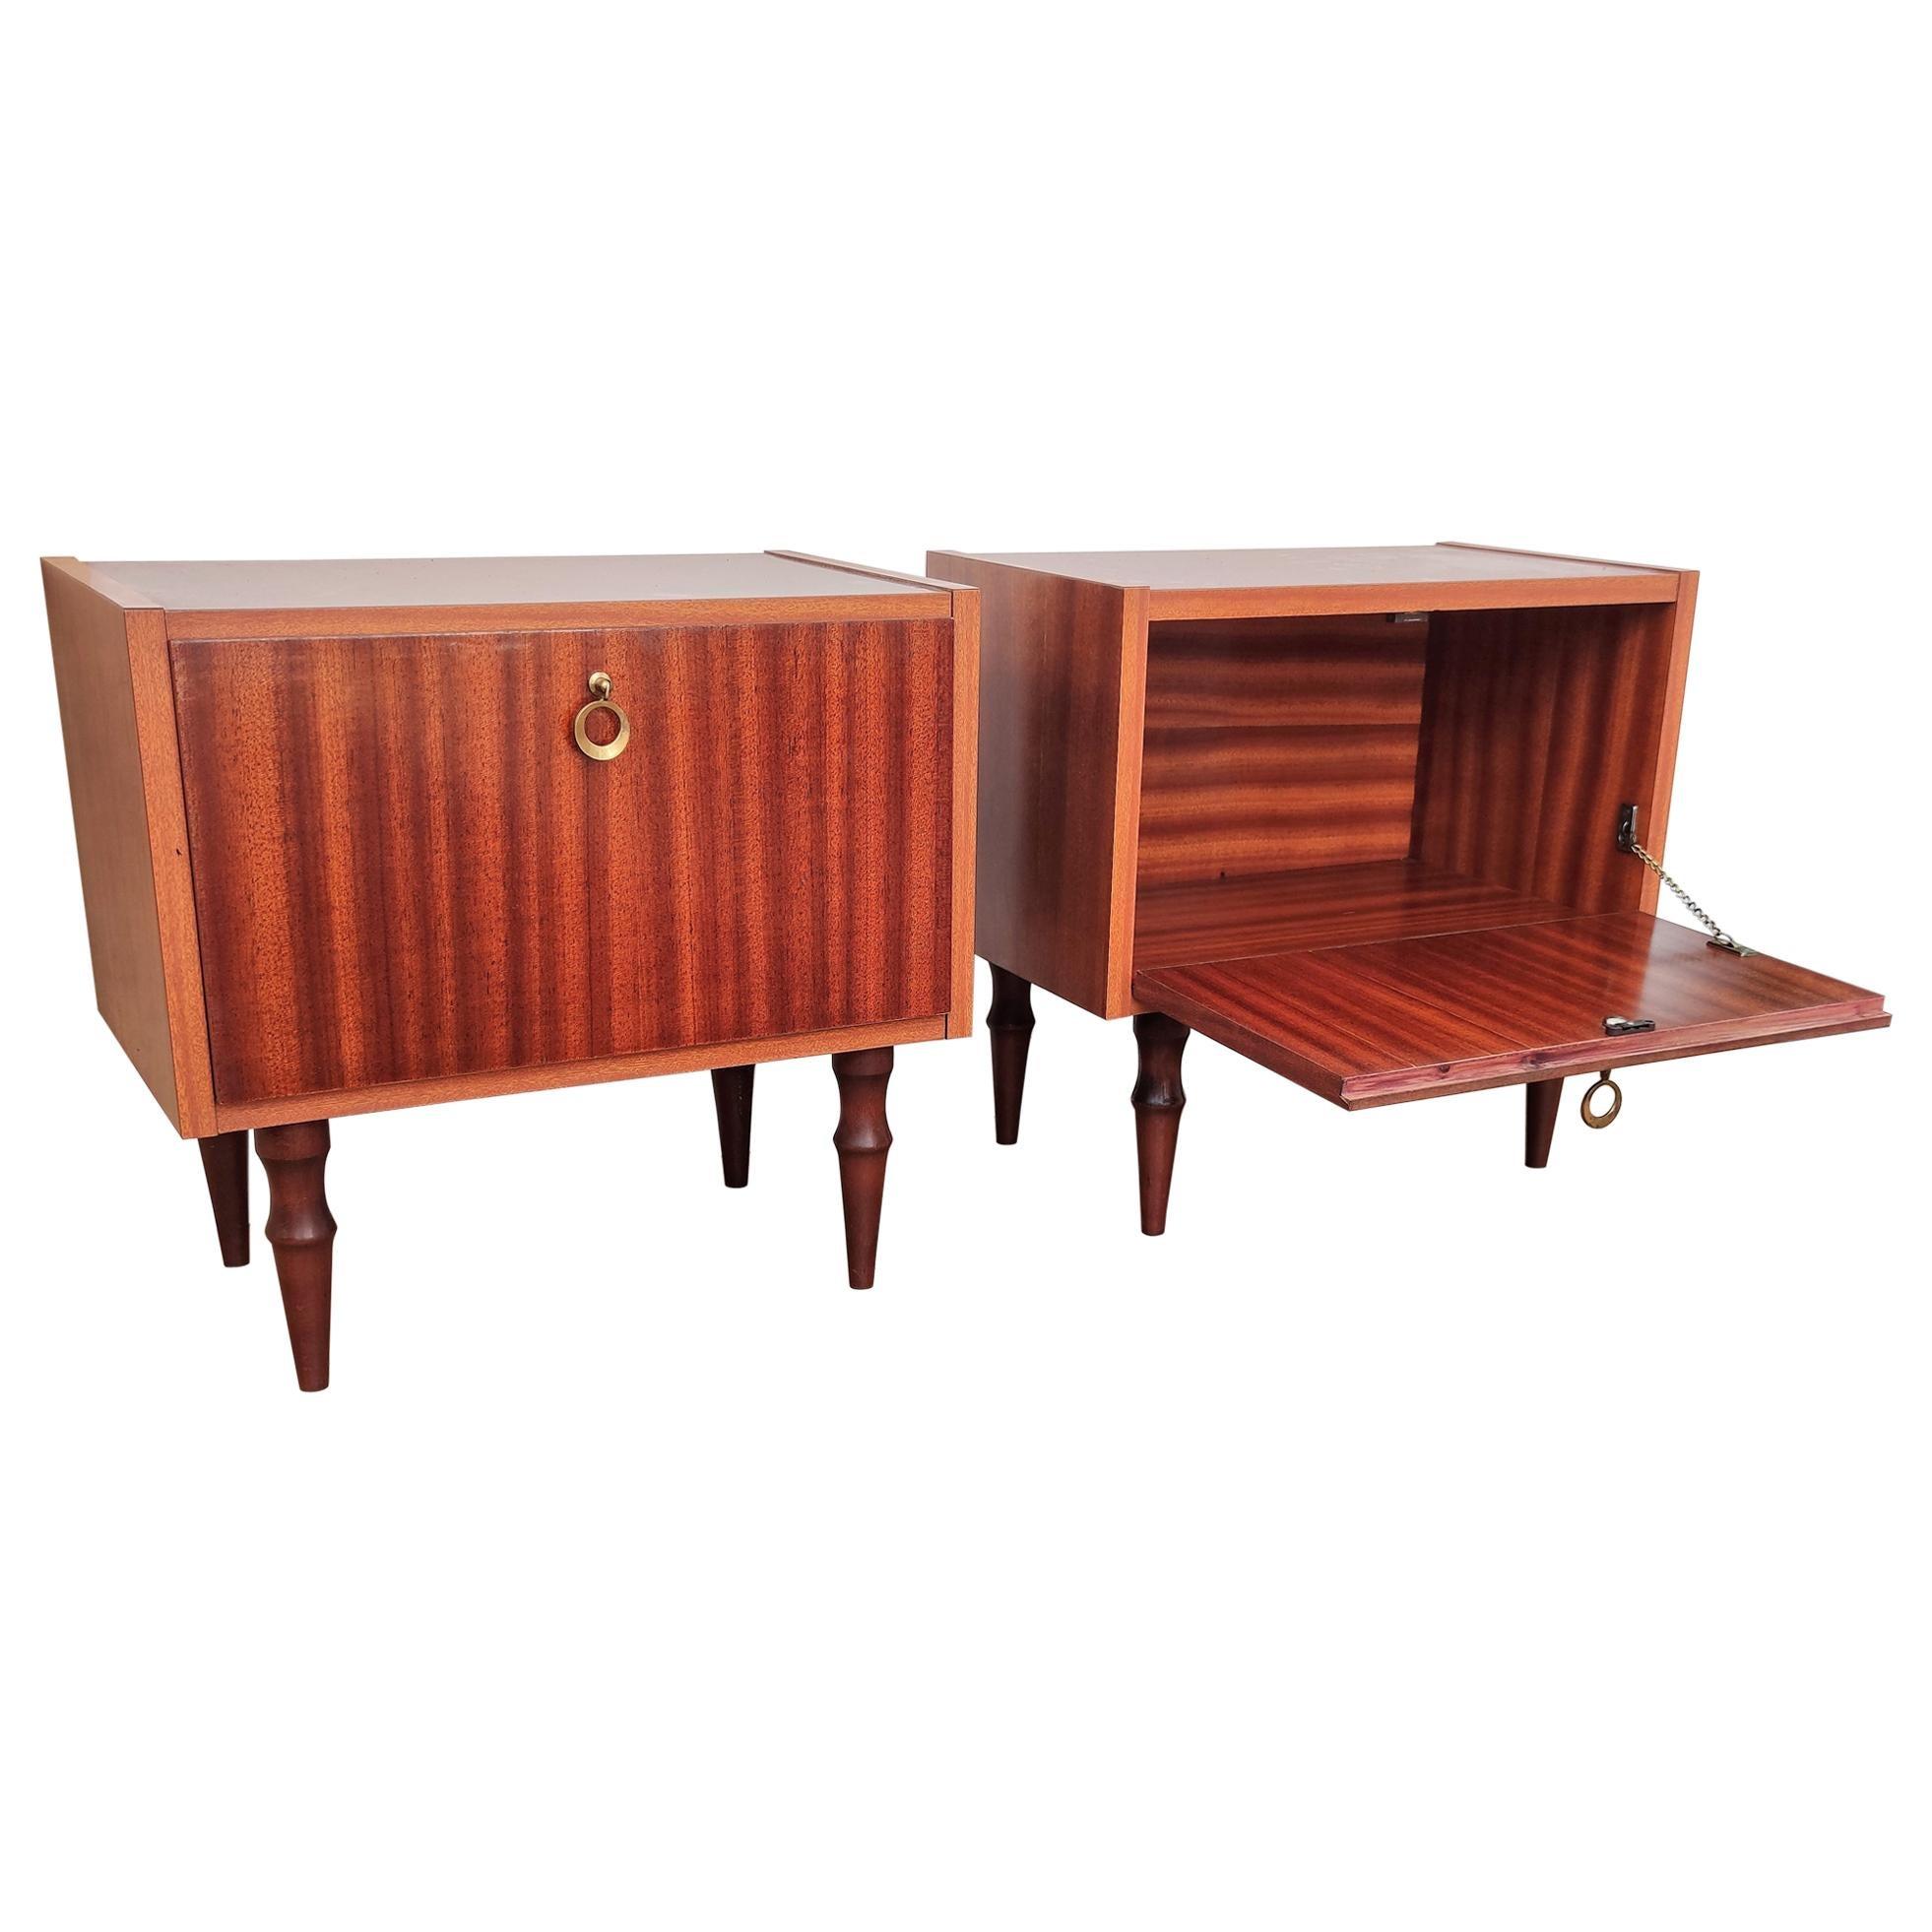 Pair of Italian Midcentury Art Deco Nightstands Bedside Tables Veneer Walnut